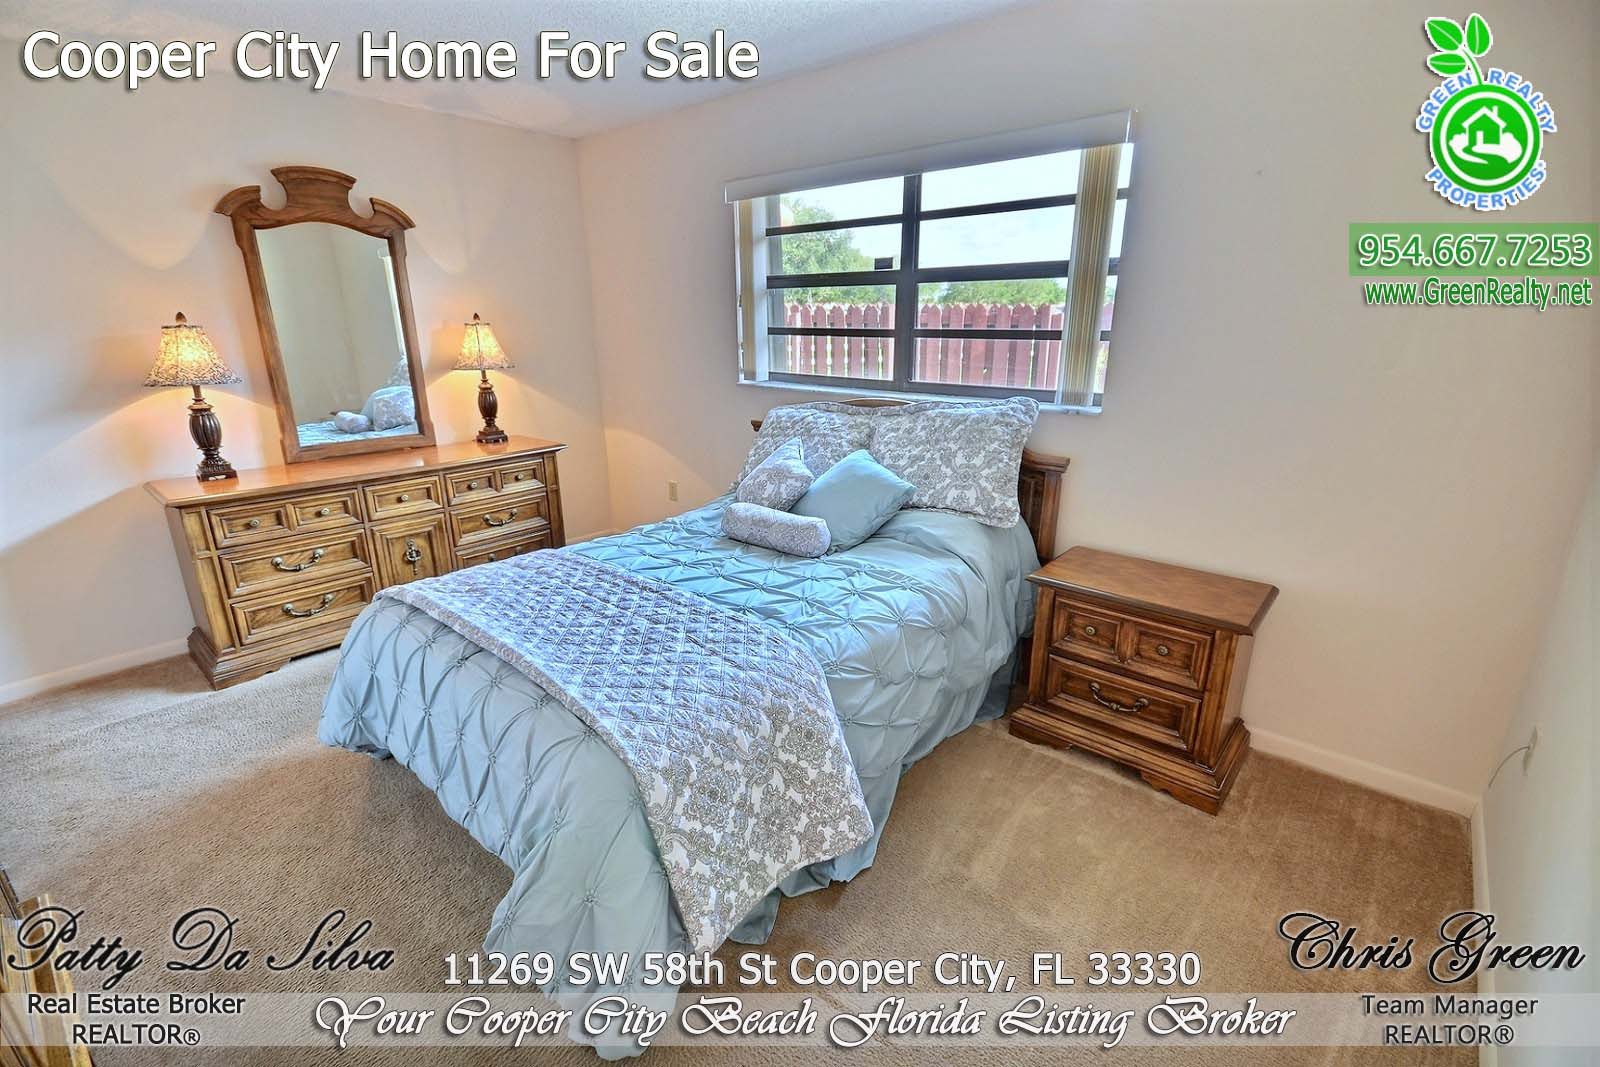 13 Cooper City Real Estate - Villas (20)